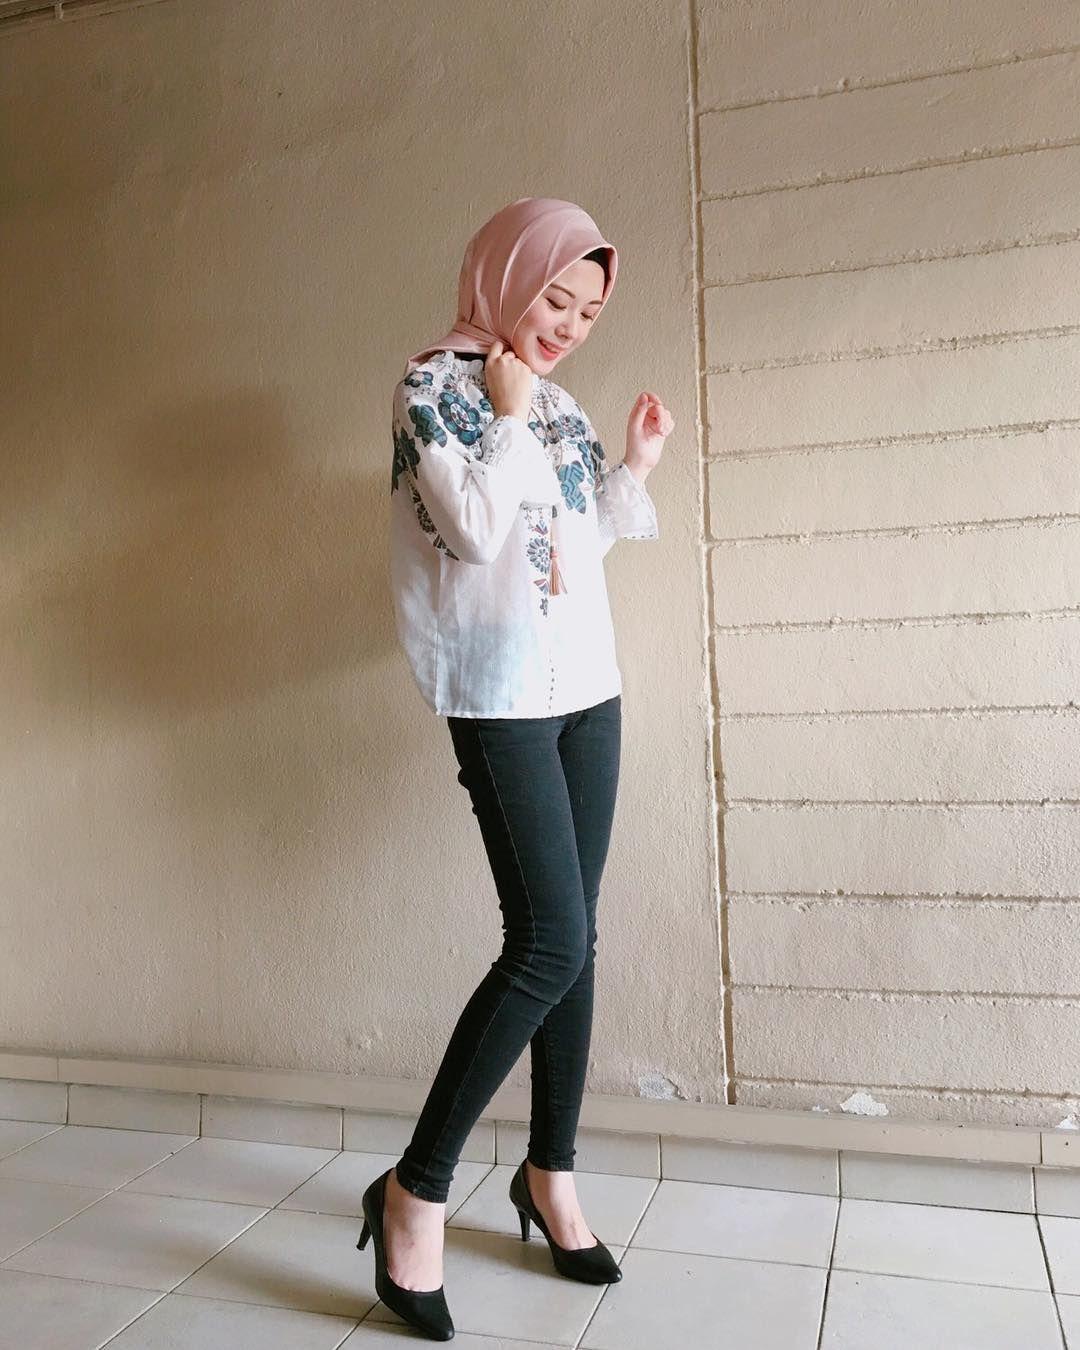 19 4k Likes 296 Comments Ayana Jihye Moon Xolovelyayana On Instagram Happy Saturday My Favorite Pants Ar New Hijab Style Hijab Fashion Beautiful Hijab